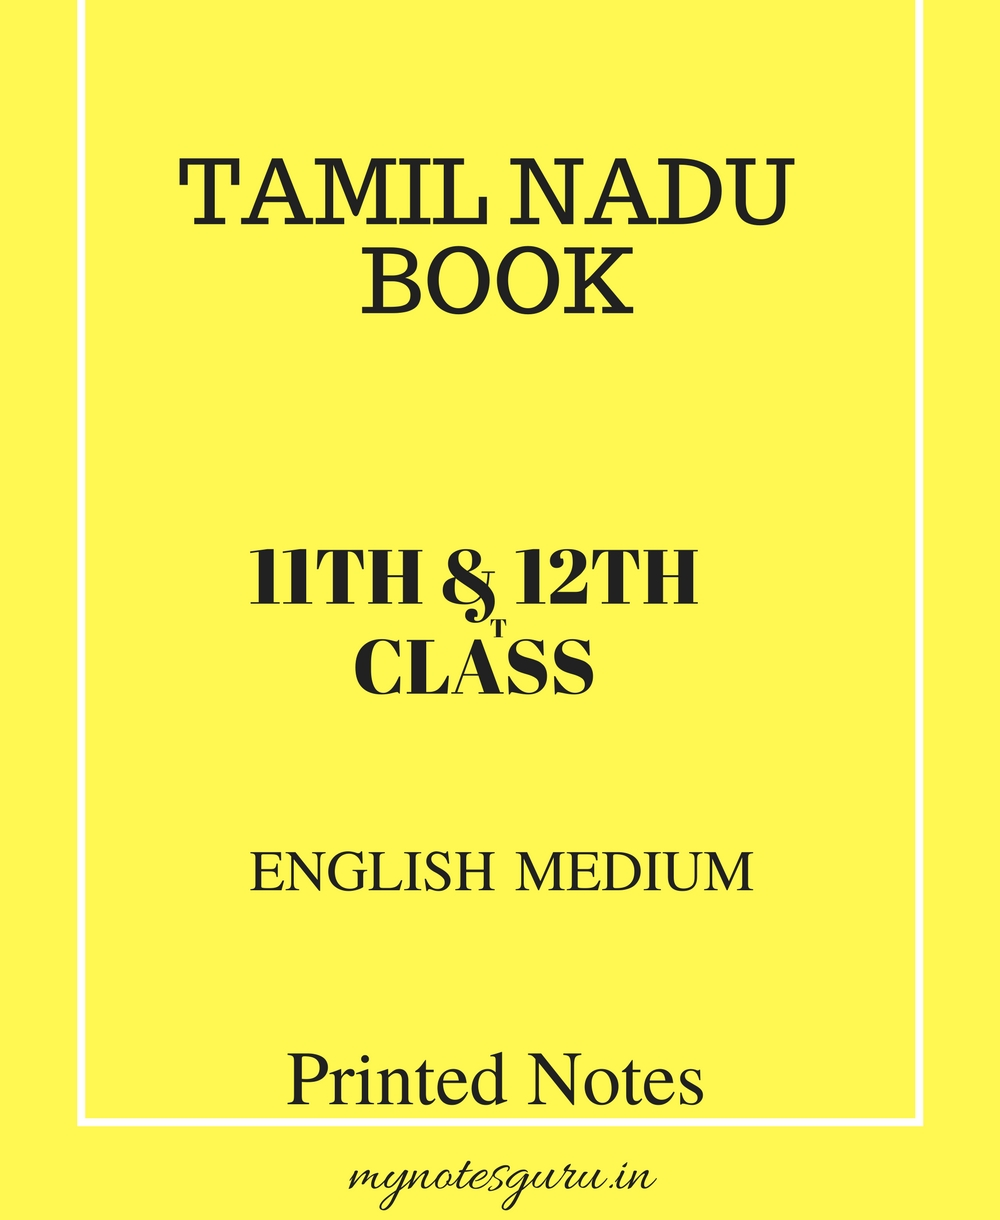 Tamil Nadu Book - 11th & 12th Class - English Medium - Printed Material